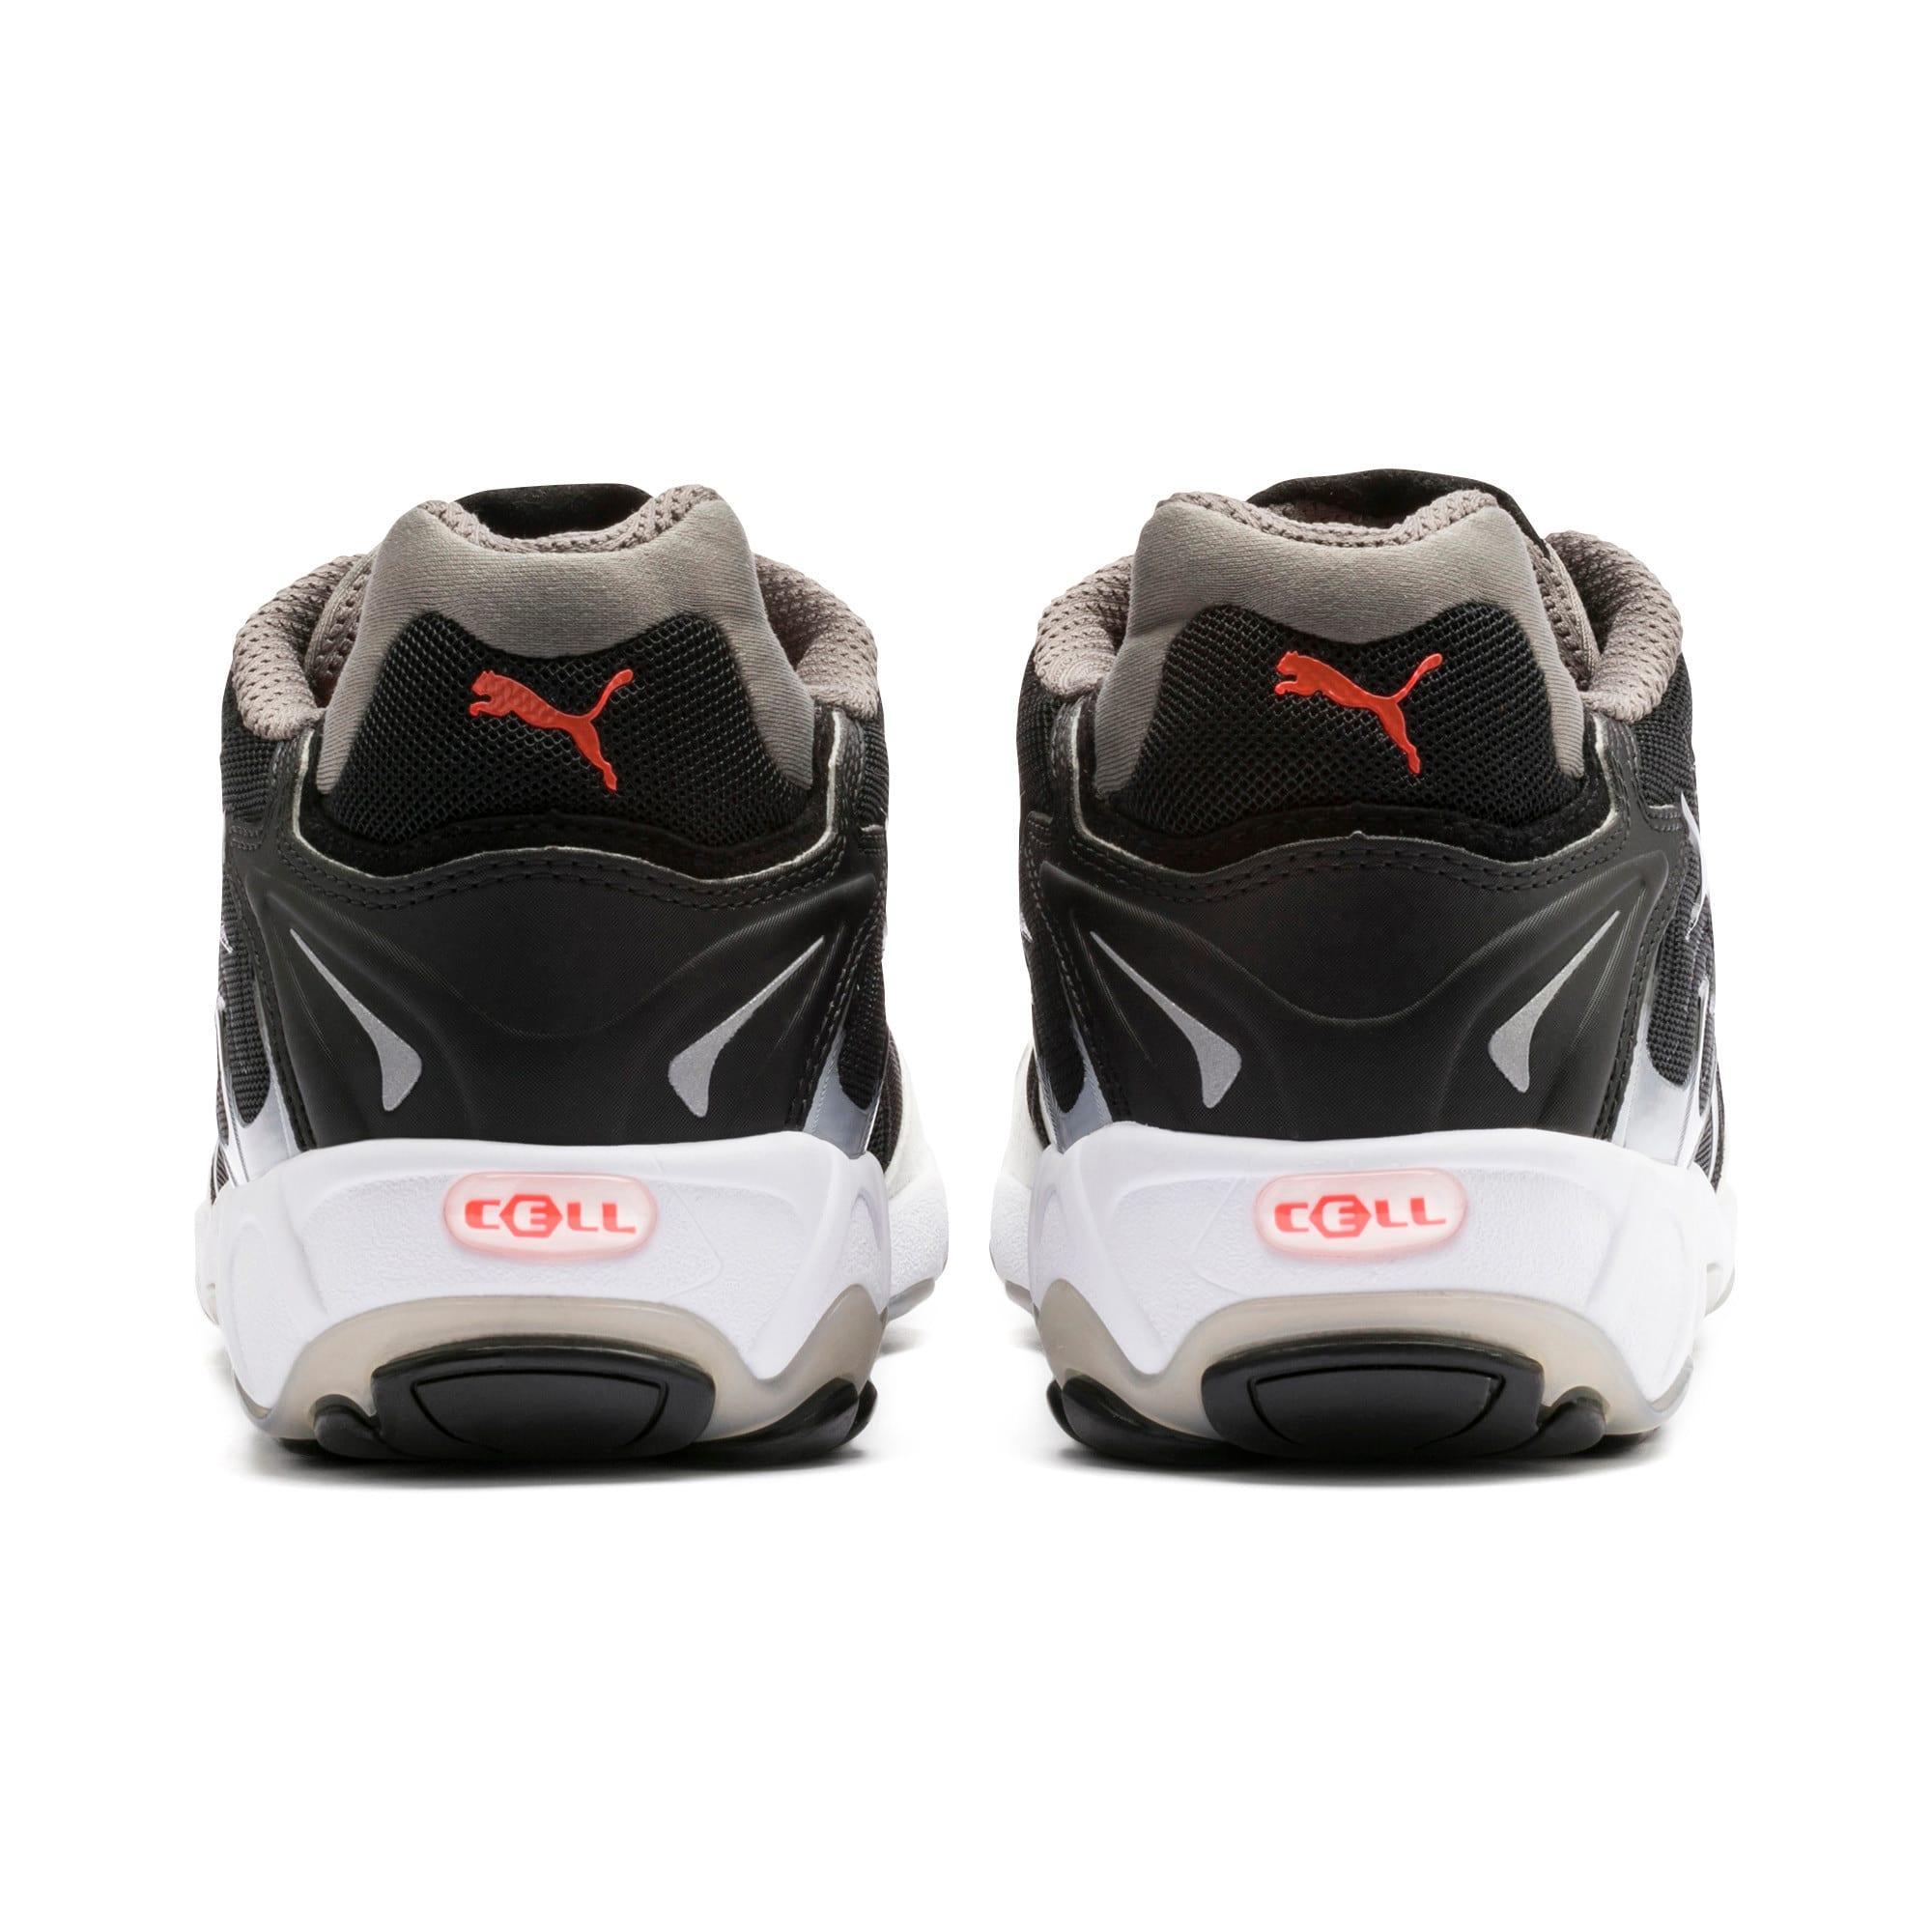 Thumbnail 4 of Inhale Flares Sneakers, Puma Black-Puma White, medium